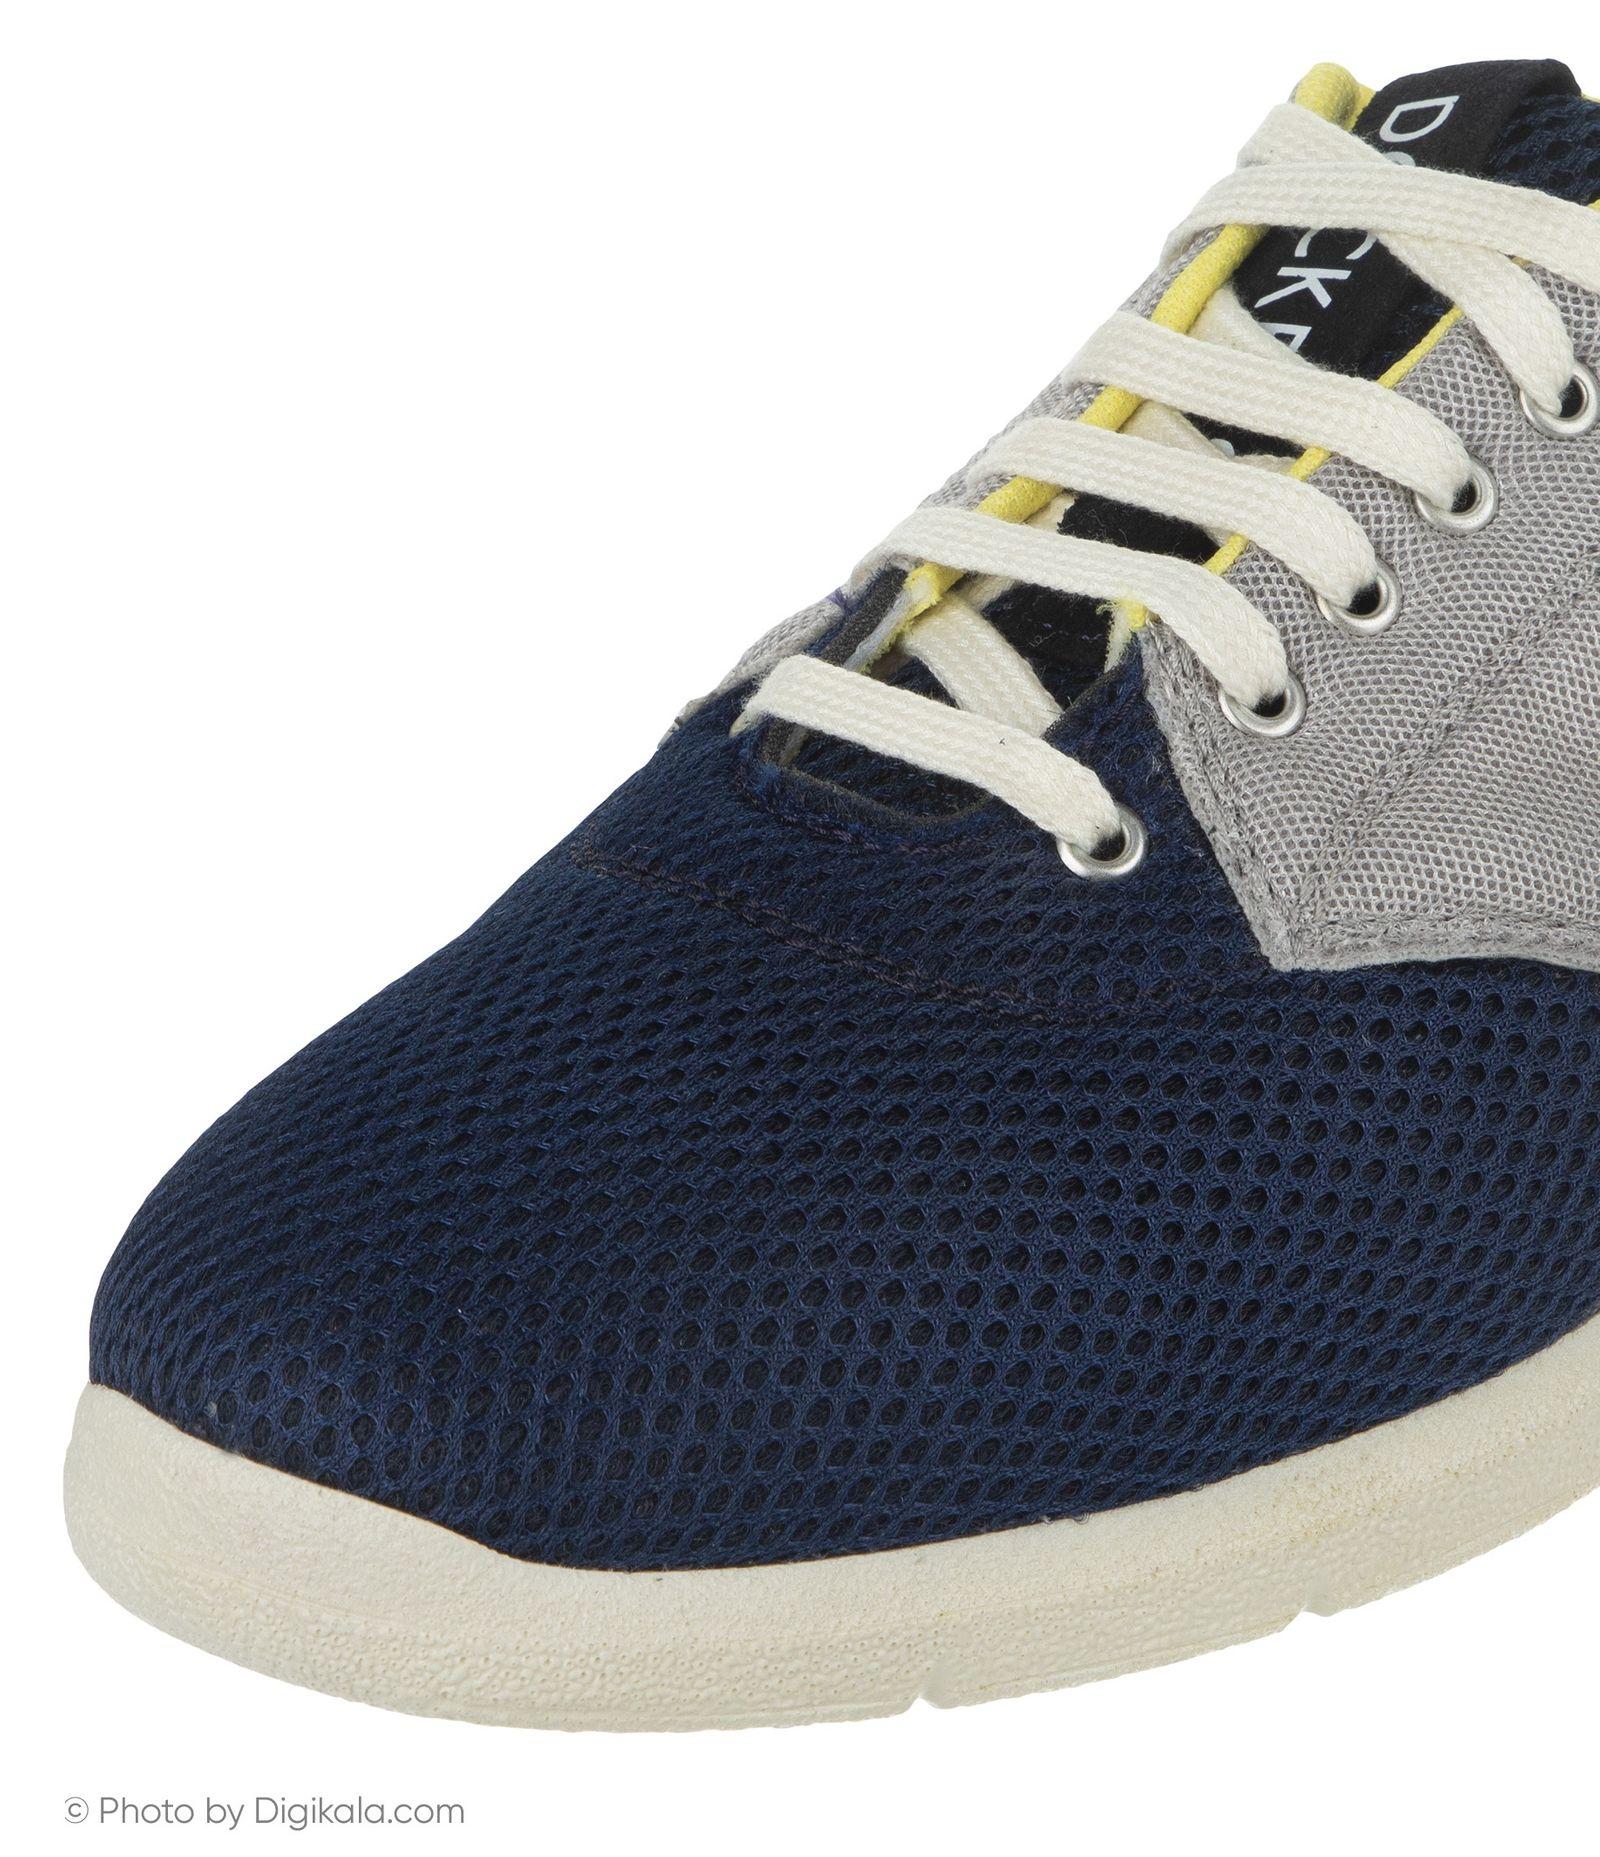 کفش روزمره مردانه داکرز مدل 100209331-101 - مشکی - 6